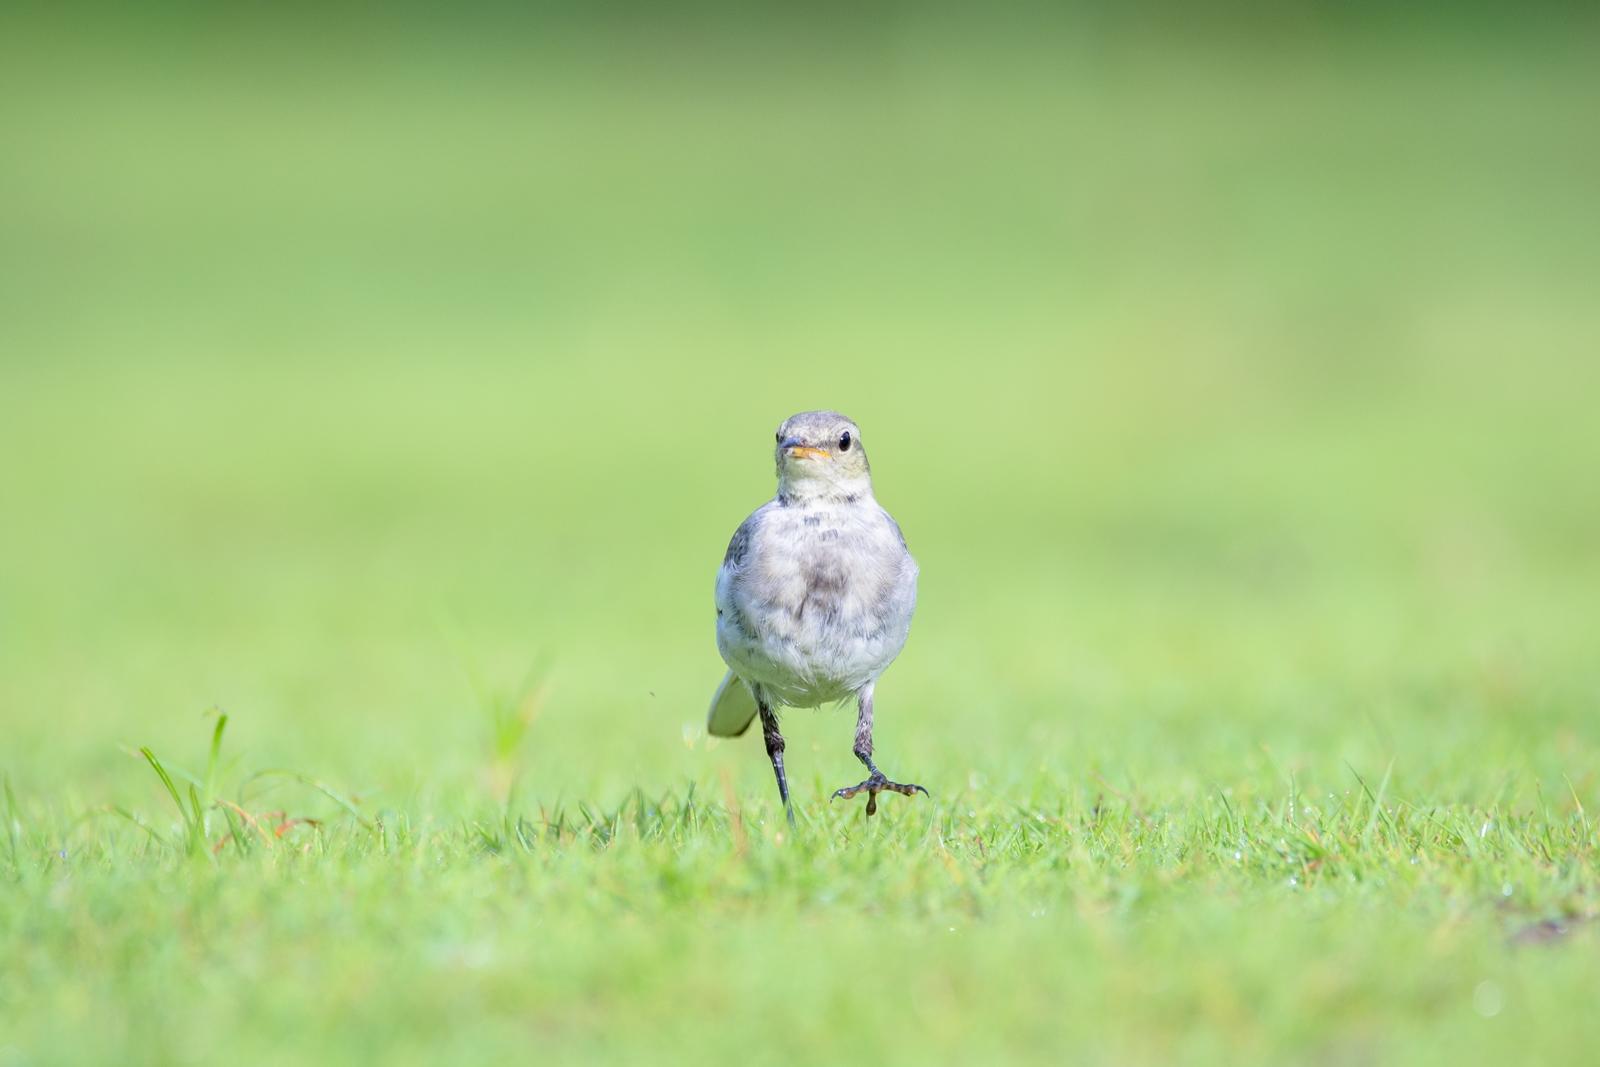 Photo: さんぽ Walk.  直向な気持ち 少しずつ前へと進む 無理なくマイペースに そして楽しみながら  White Wagtail. (ハクセキレイ)  #birdphotography #birds #cooljapan #kawaii #nikon #sigma  Nikon D7200 SIGMA 150-600mm F5-6.3 DG OS HSM Contemporary